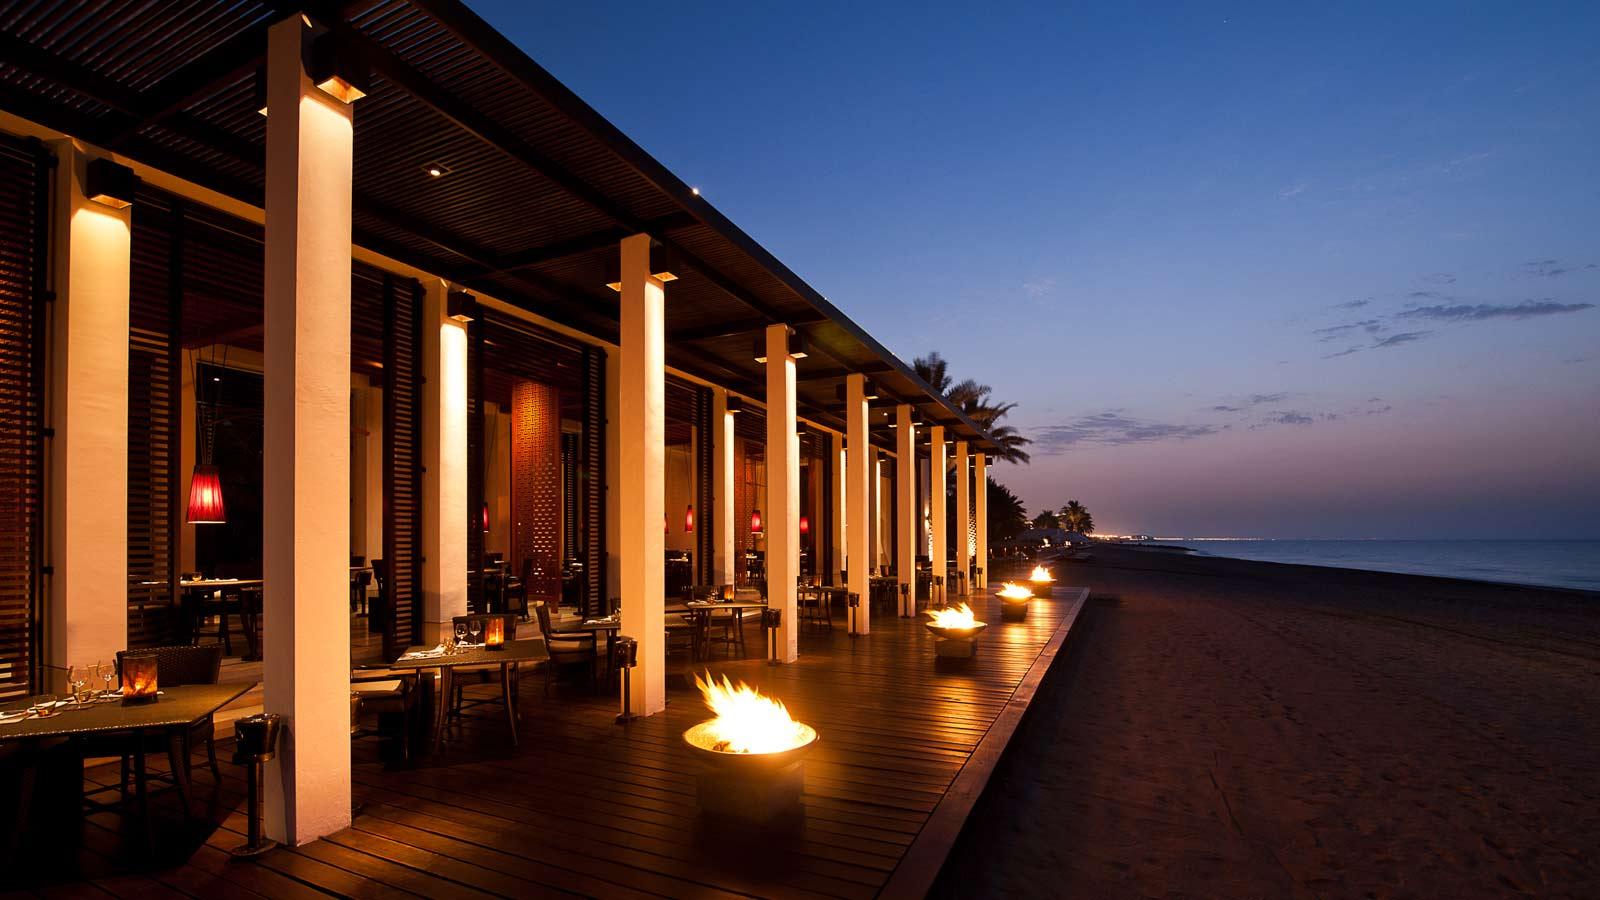 Fine dining restaurant exterior - Outside Of Fancy Restaurants The Beach Resta